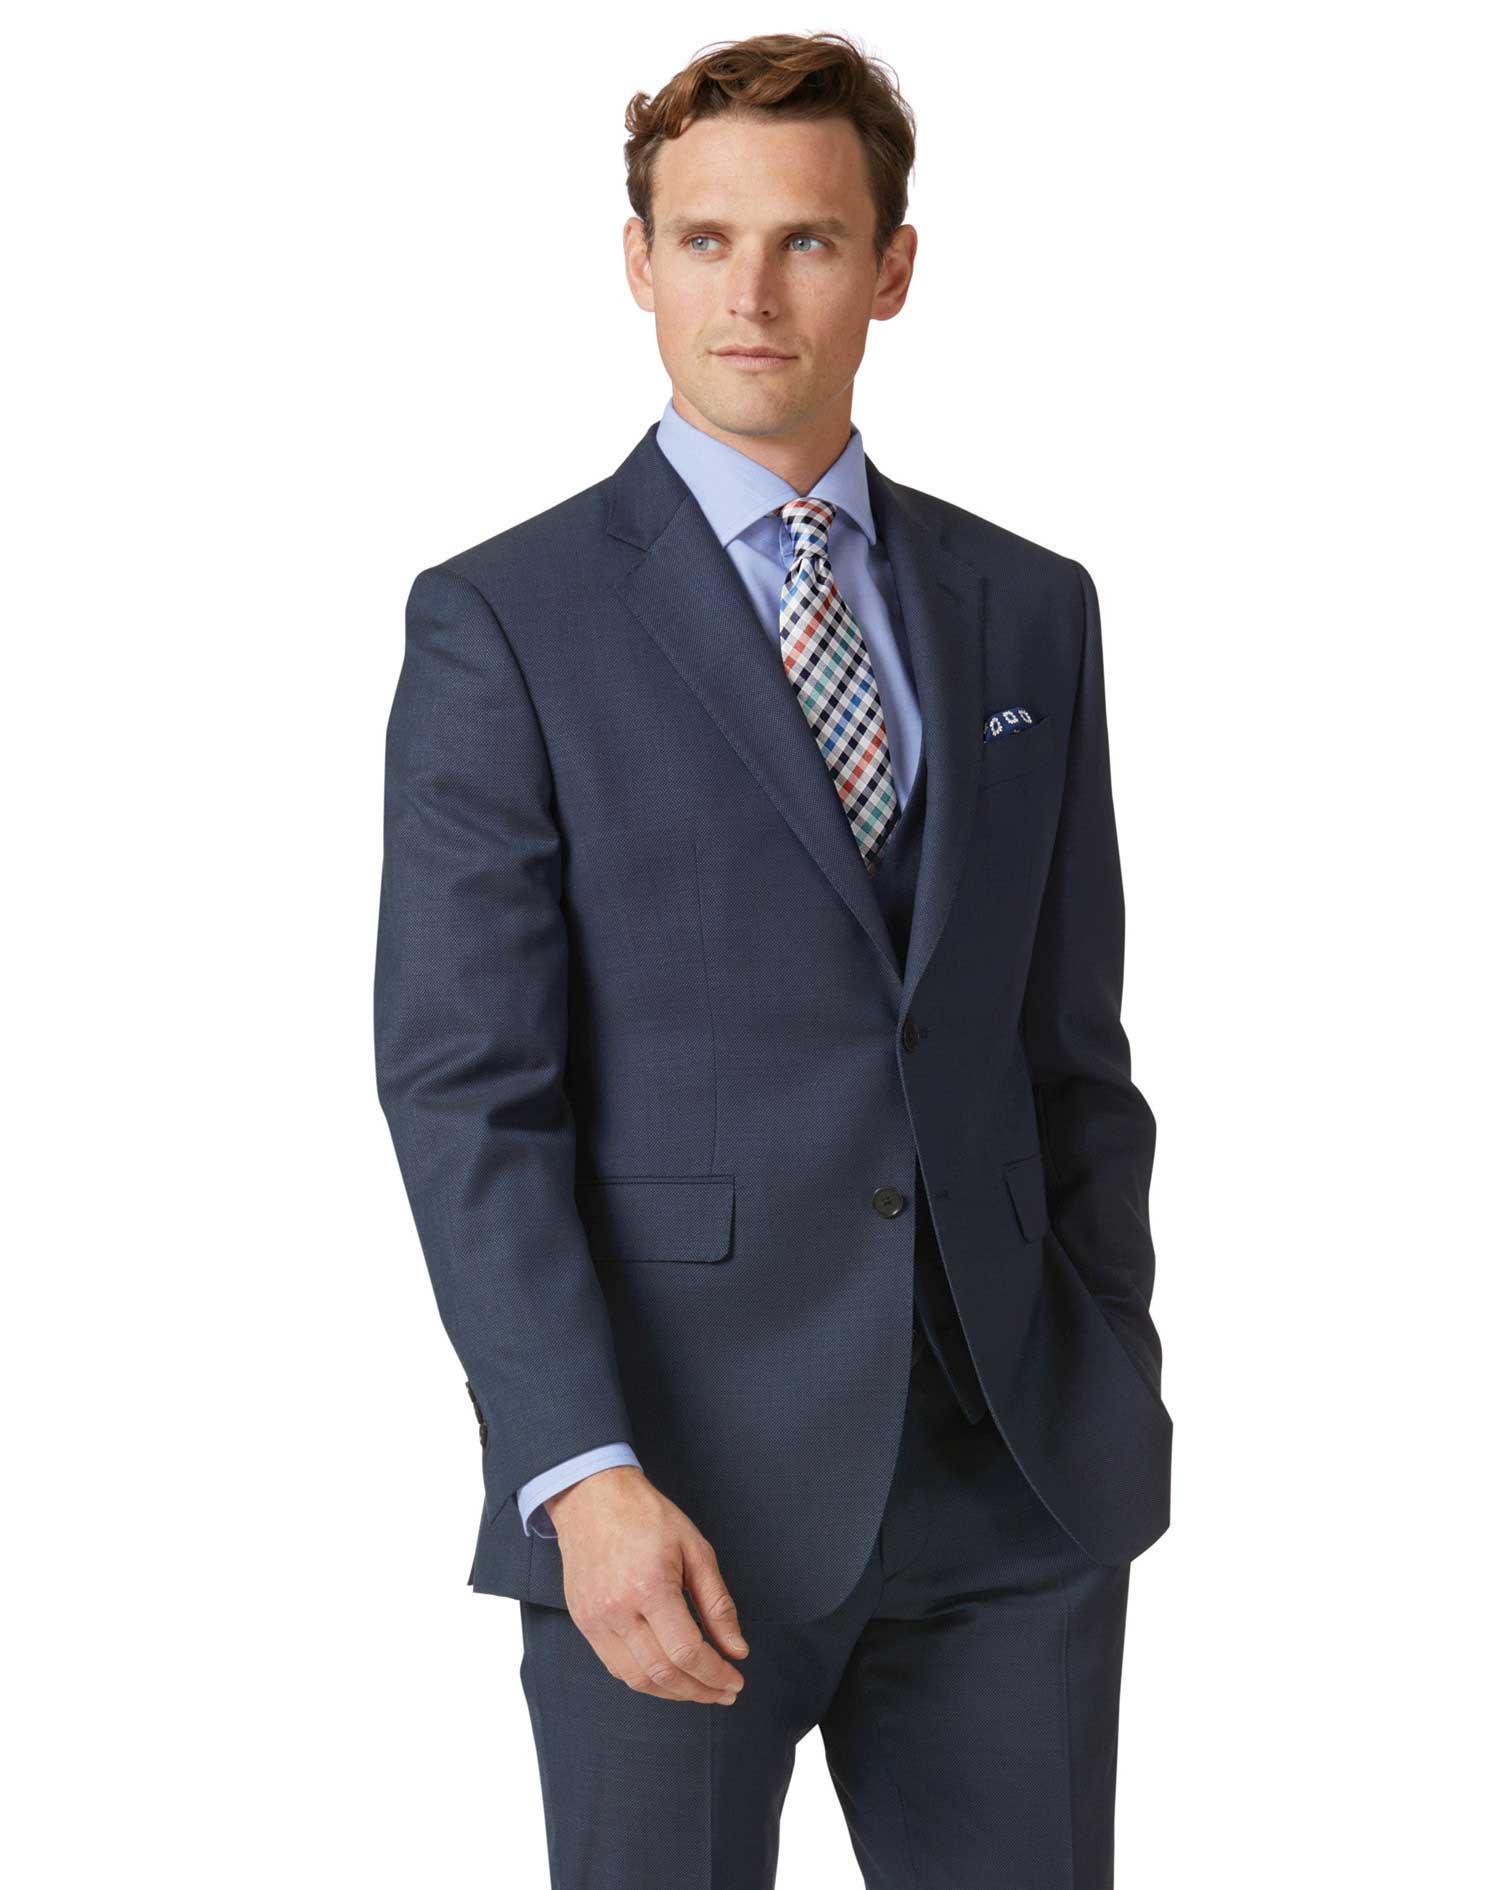 Image of Charles Tyrwhitt Airforce Blue Slim Fit Birdseye Travel Suit Wool Jacket Size 36 Short by Charles Tyrwhitt